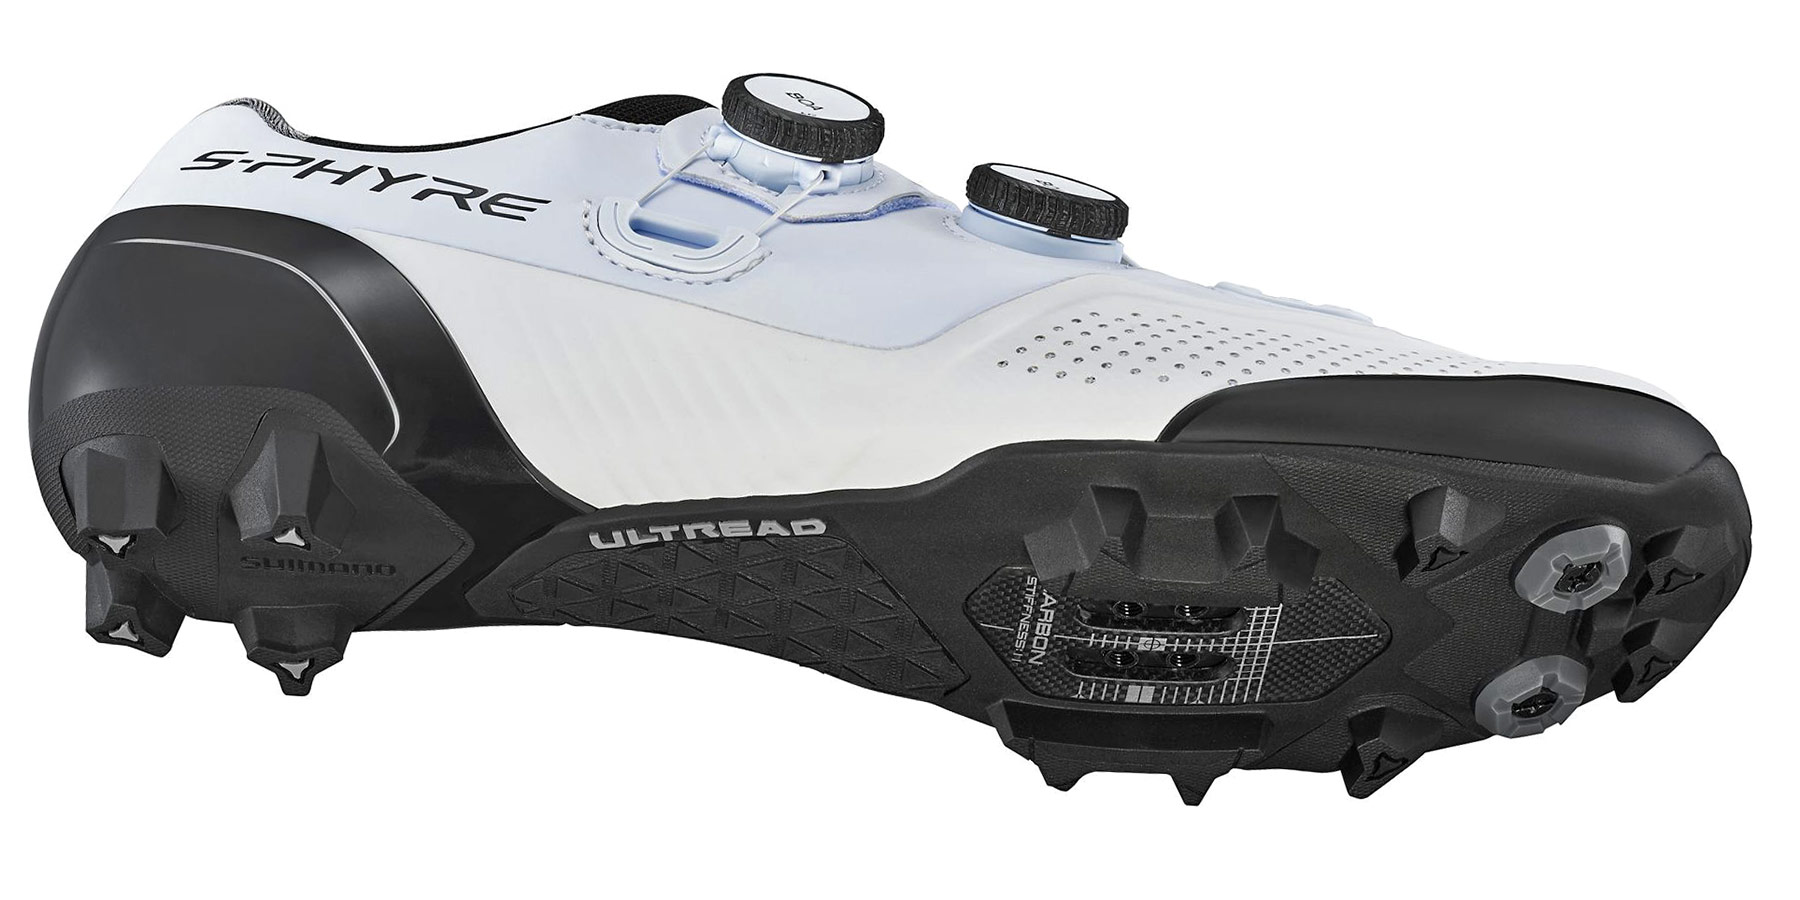 Shimano S-Phyre XC902 MTB shoes, next-gen XC9 cross-country mountain bike shoe,new rubber sole